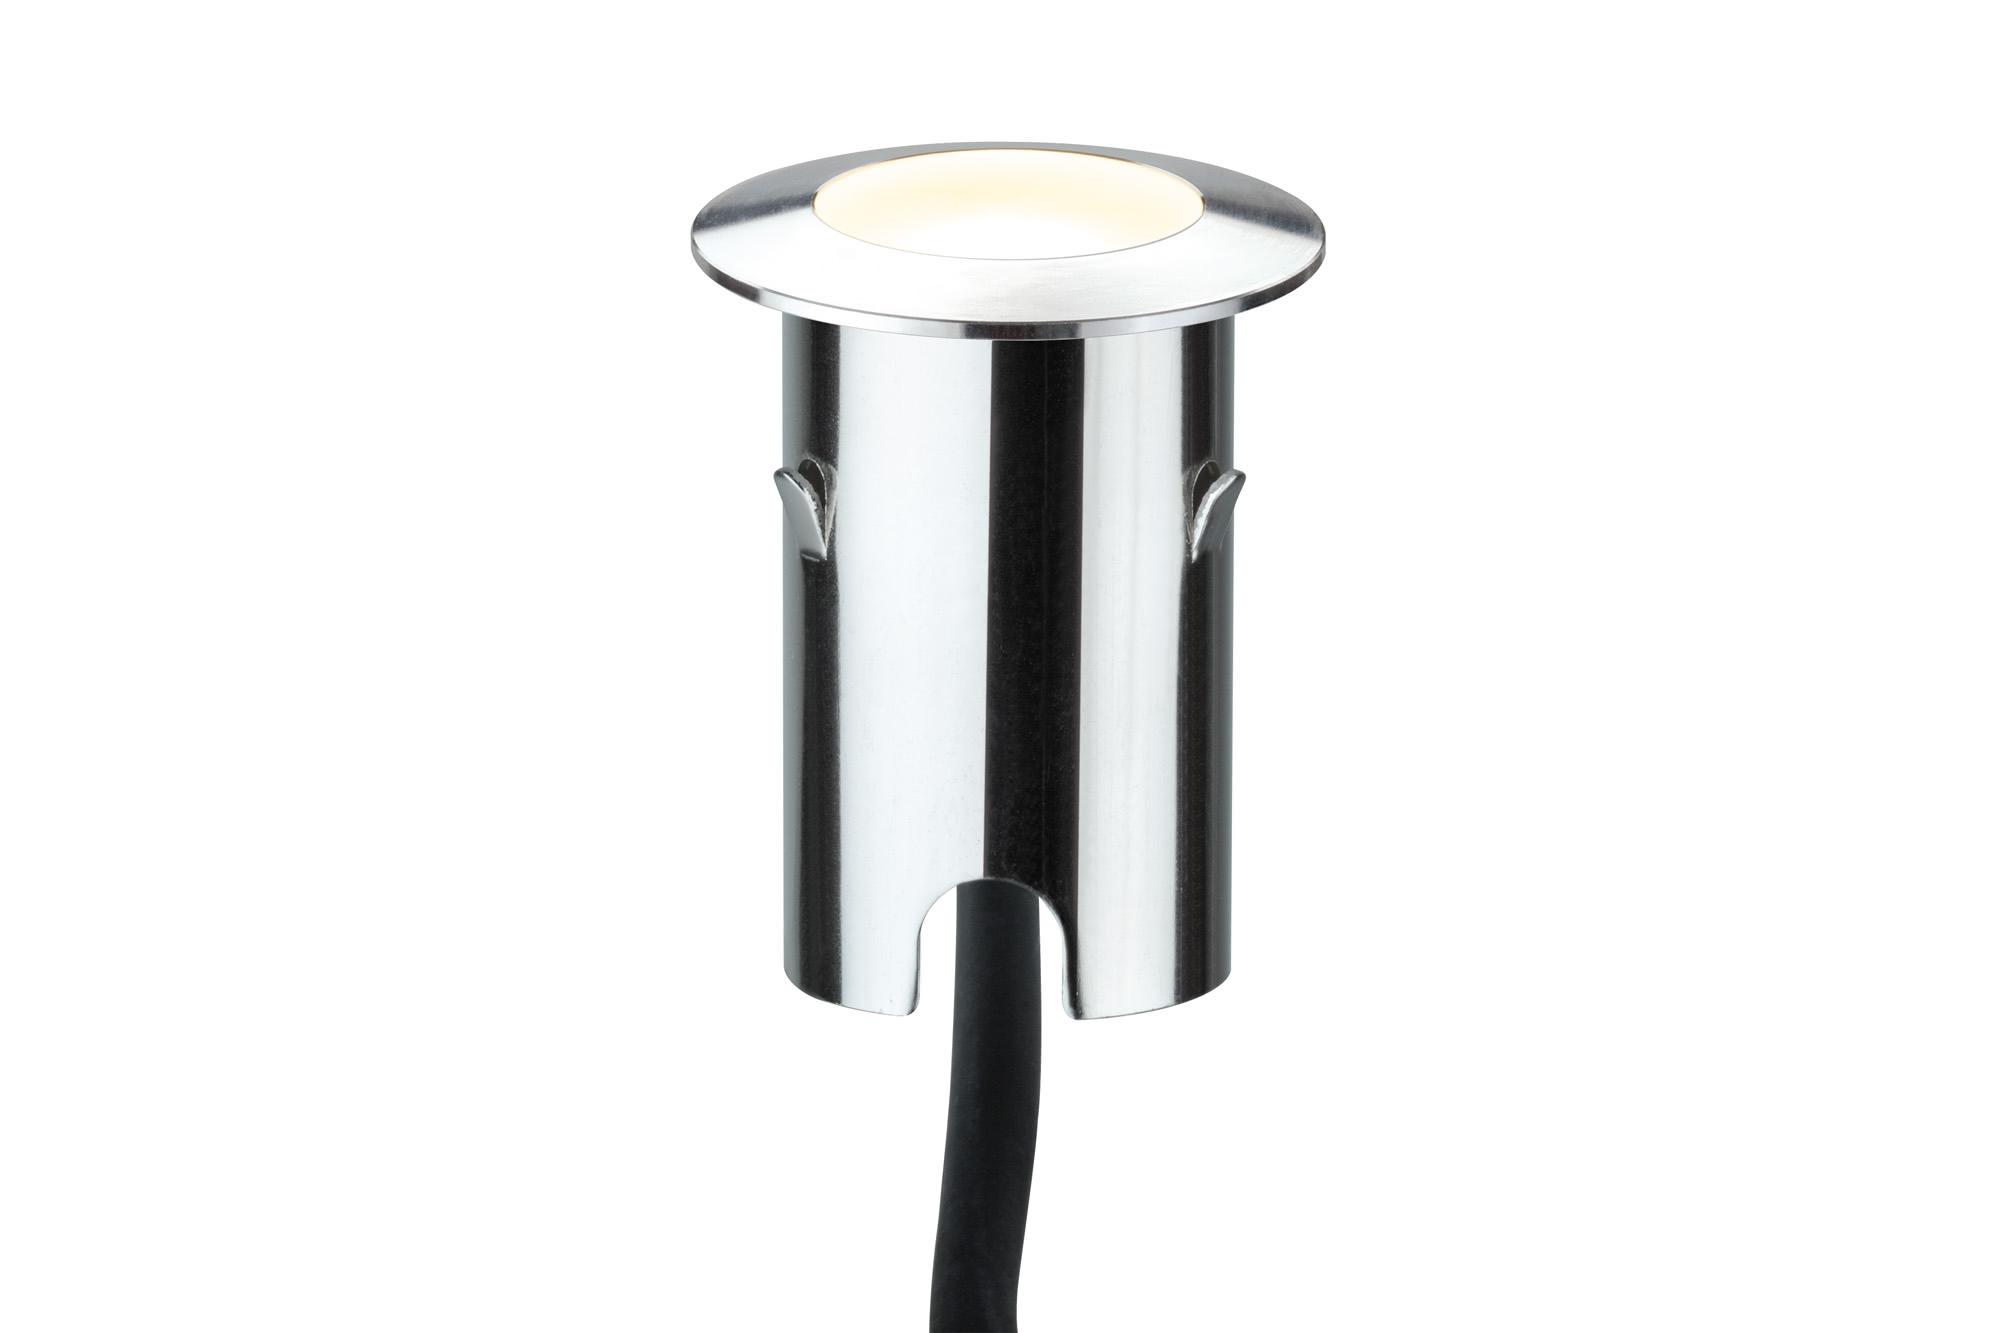 Paulmann. 93784 Комплект светильников MiniBoden EBL rund IP67 Basis 4x1W Est